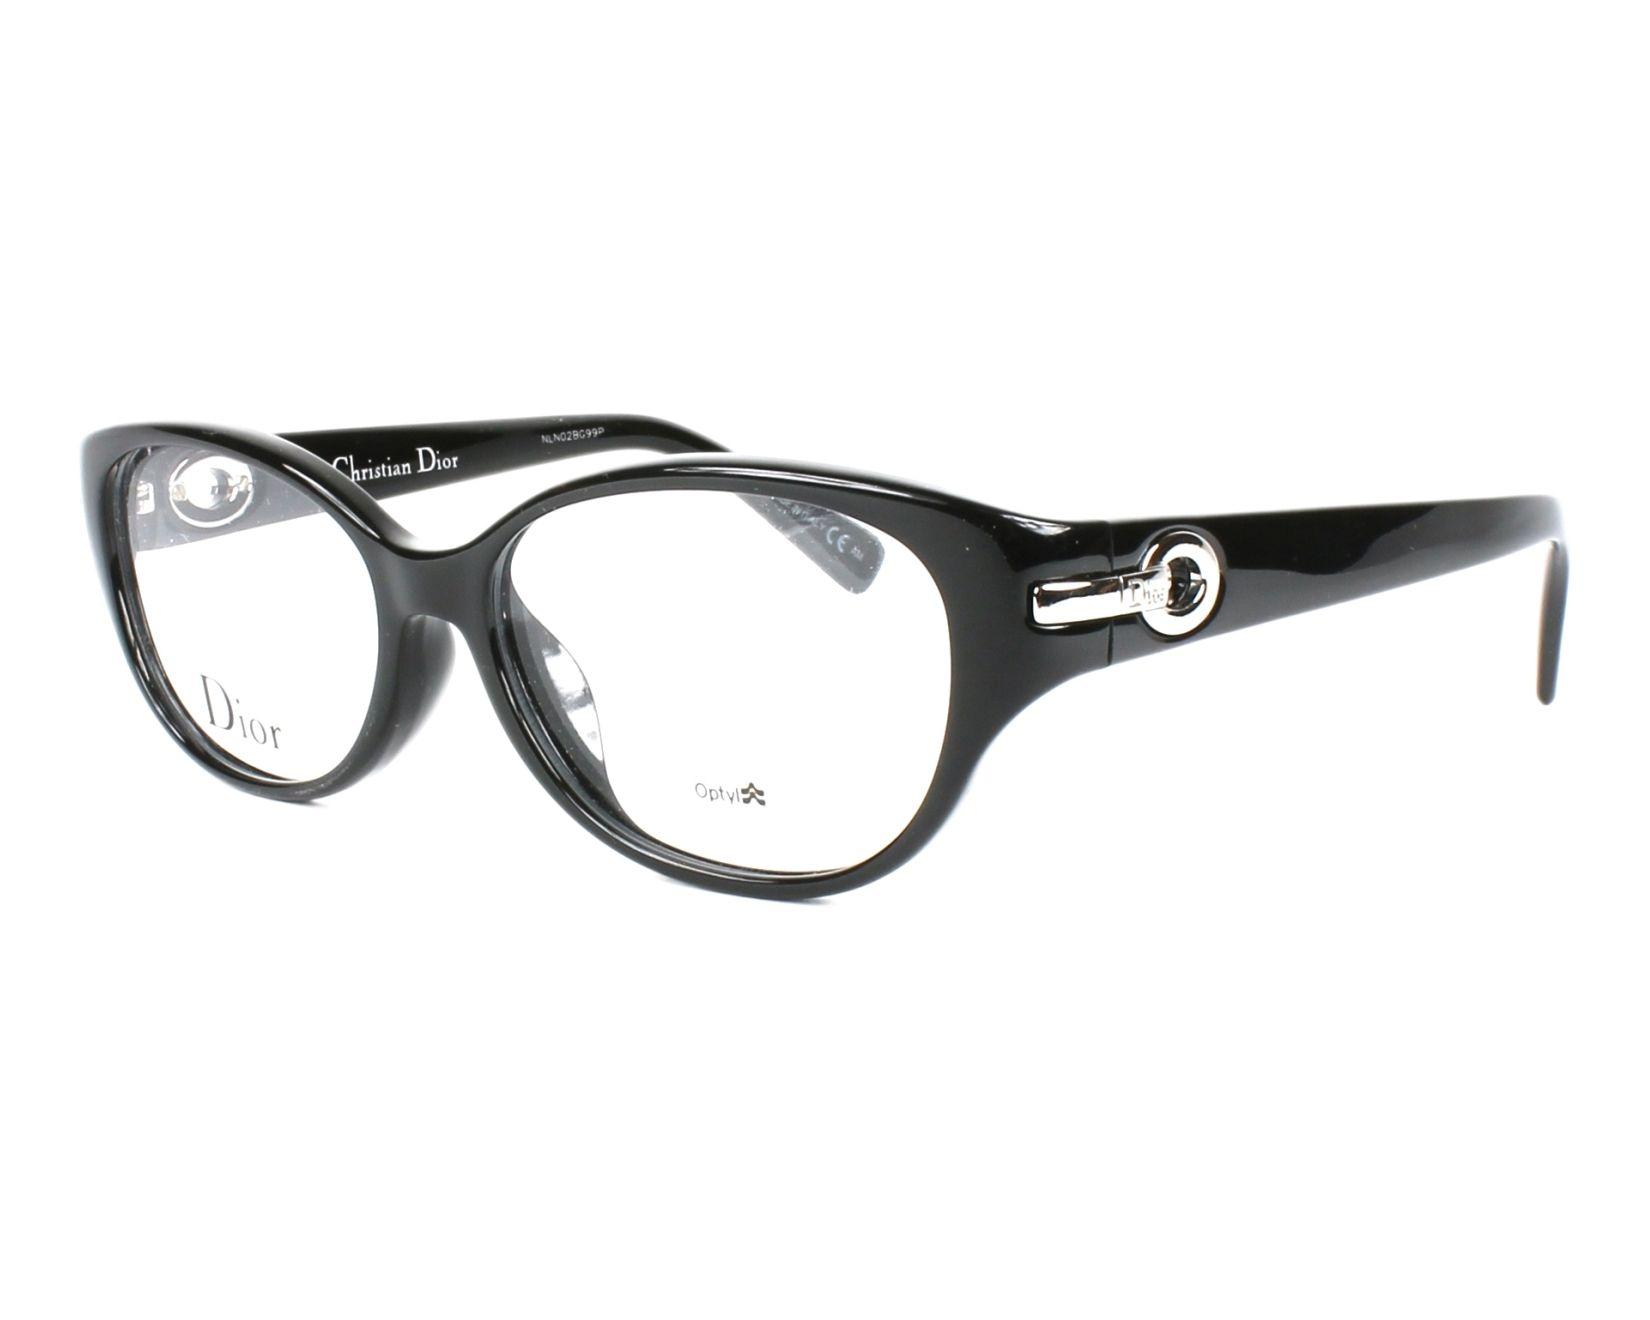 2fe4283aca23 Christian Dior Eyeglass Case